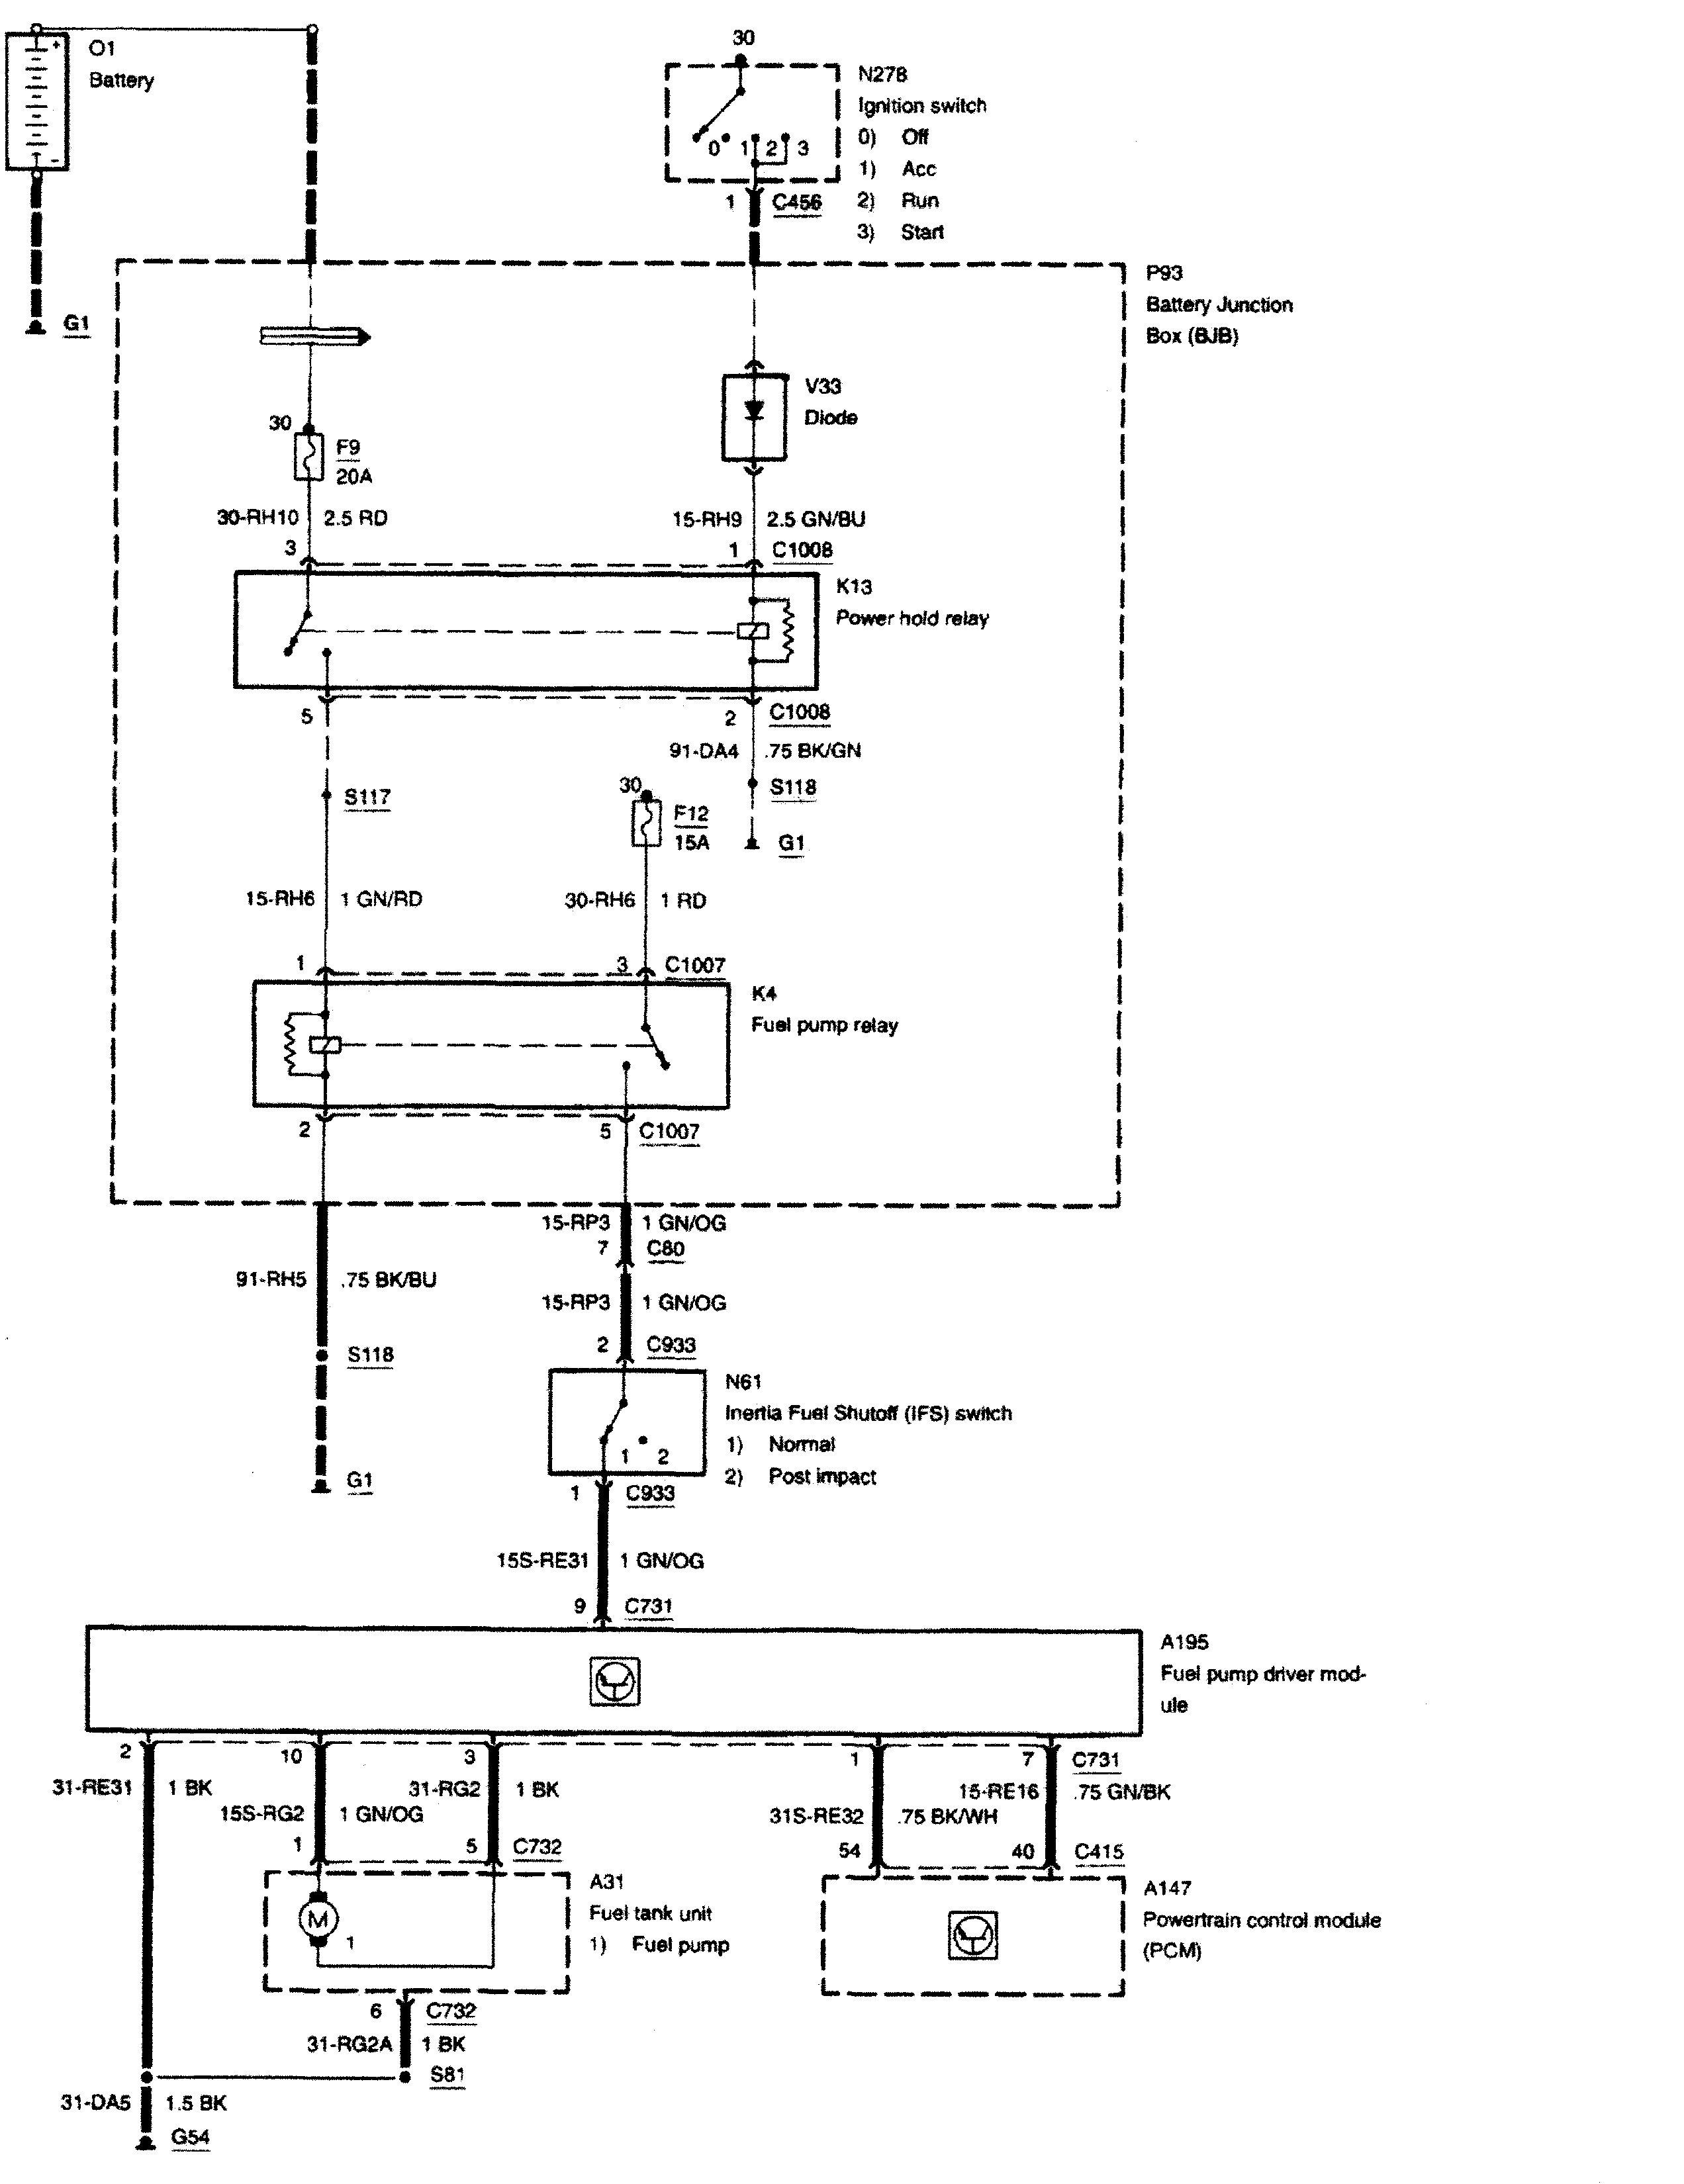 images?q=tbn:ANd9GcQh_l3eQ5xwiPy07kGEXjmjgmBKBRB7H2mRxCGhv1tFWg5c_mWT Fuel Pump Wiring